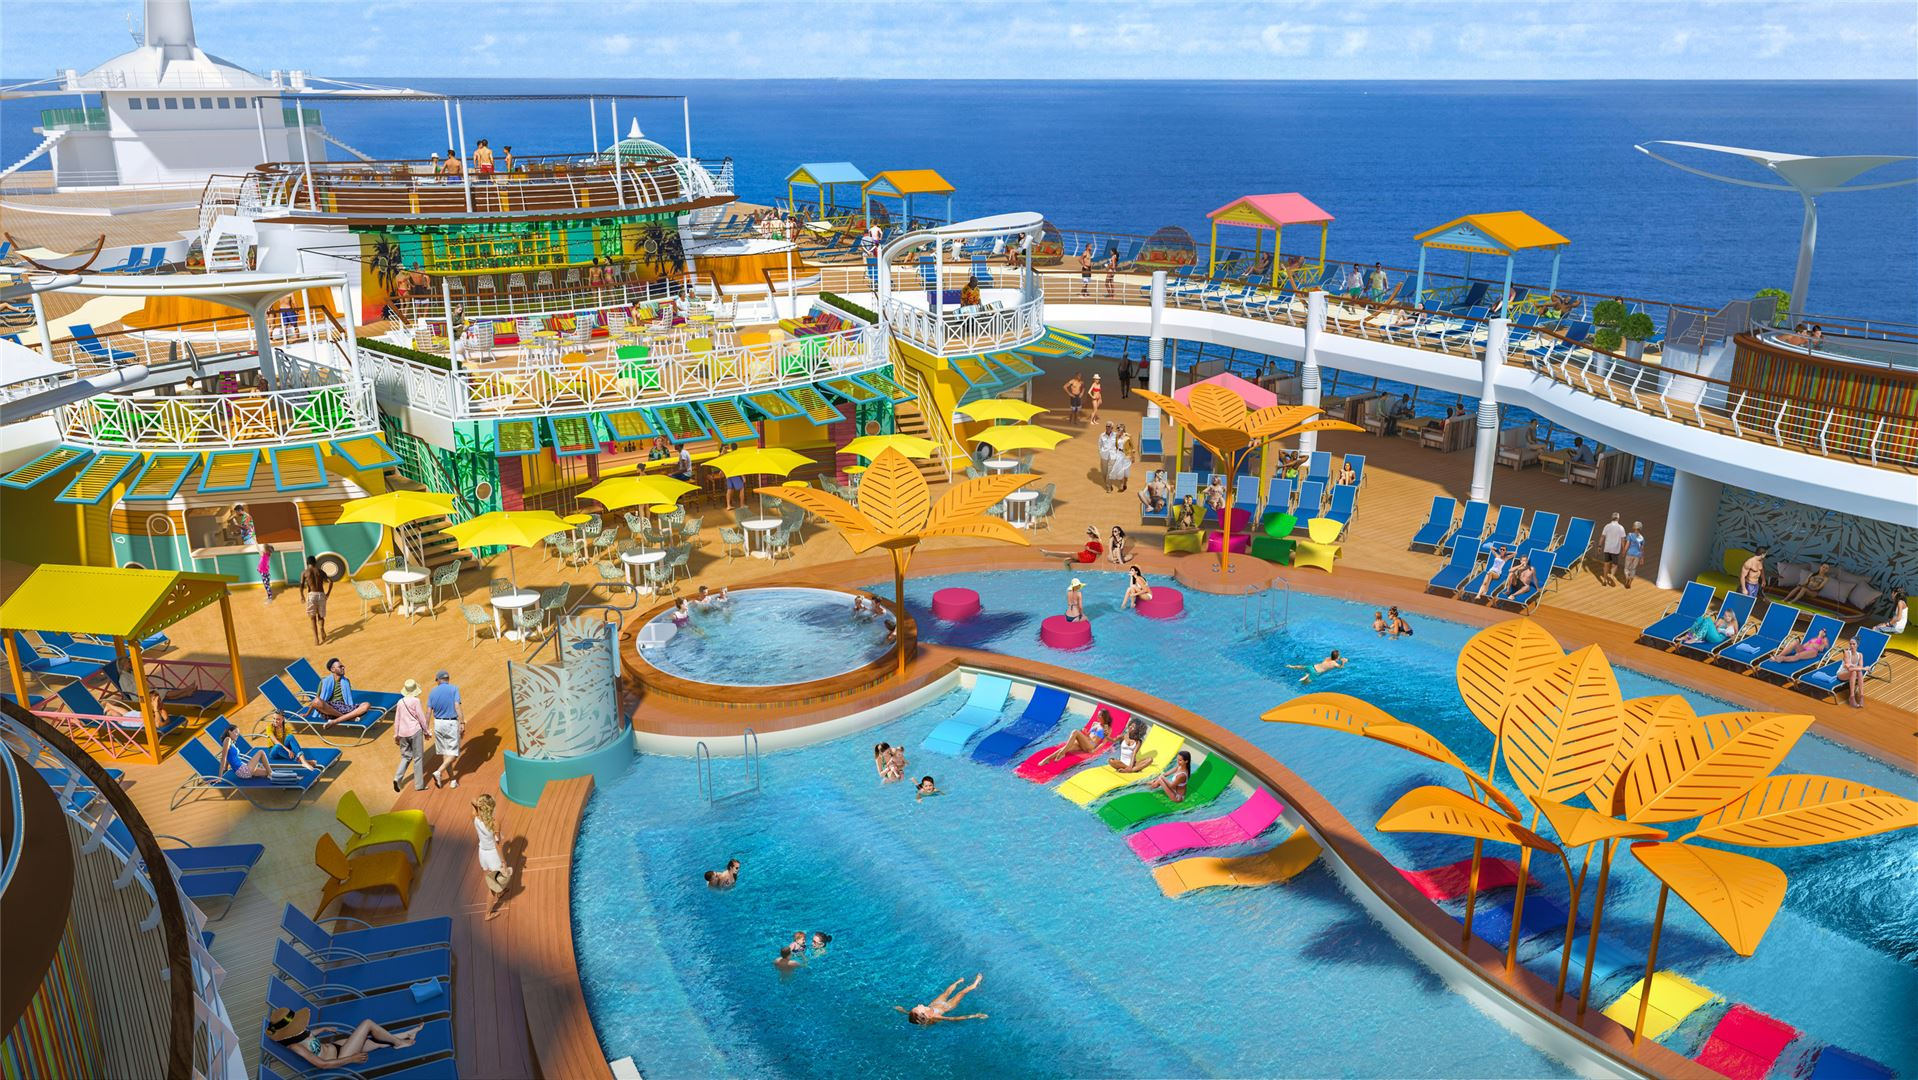 Navigator of the Seas pool deck.